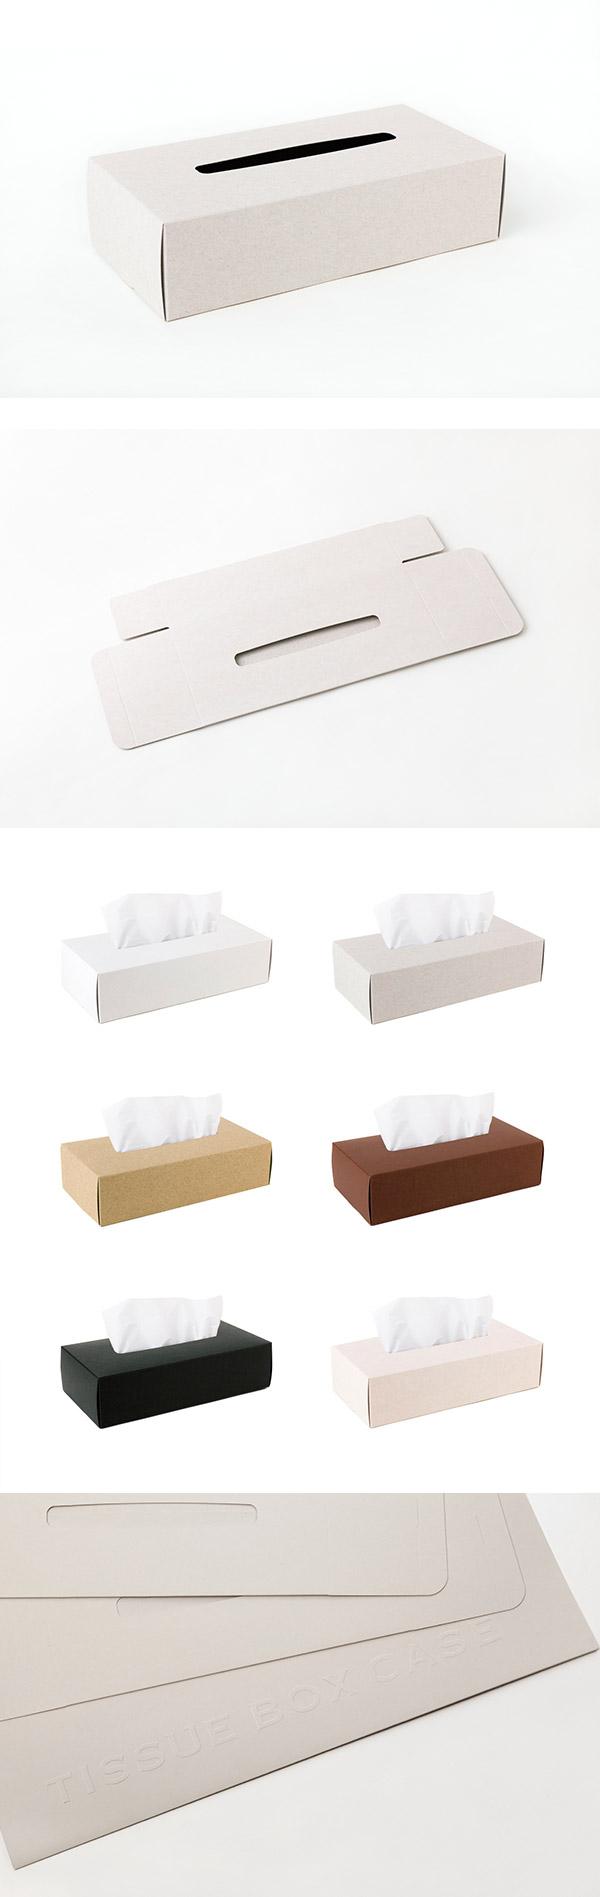 Perrocaliente TISSUE BOX CASE 面紙盒 2入 灰色